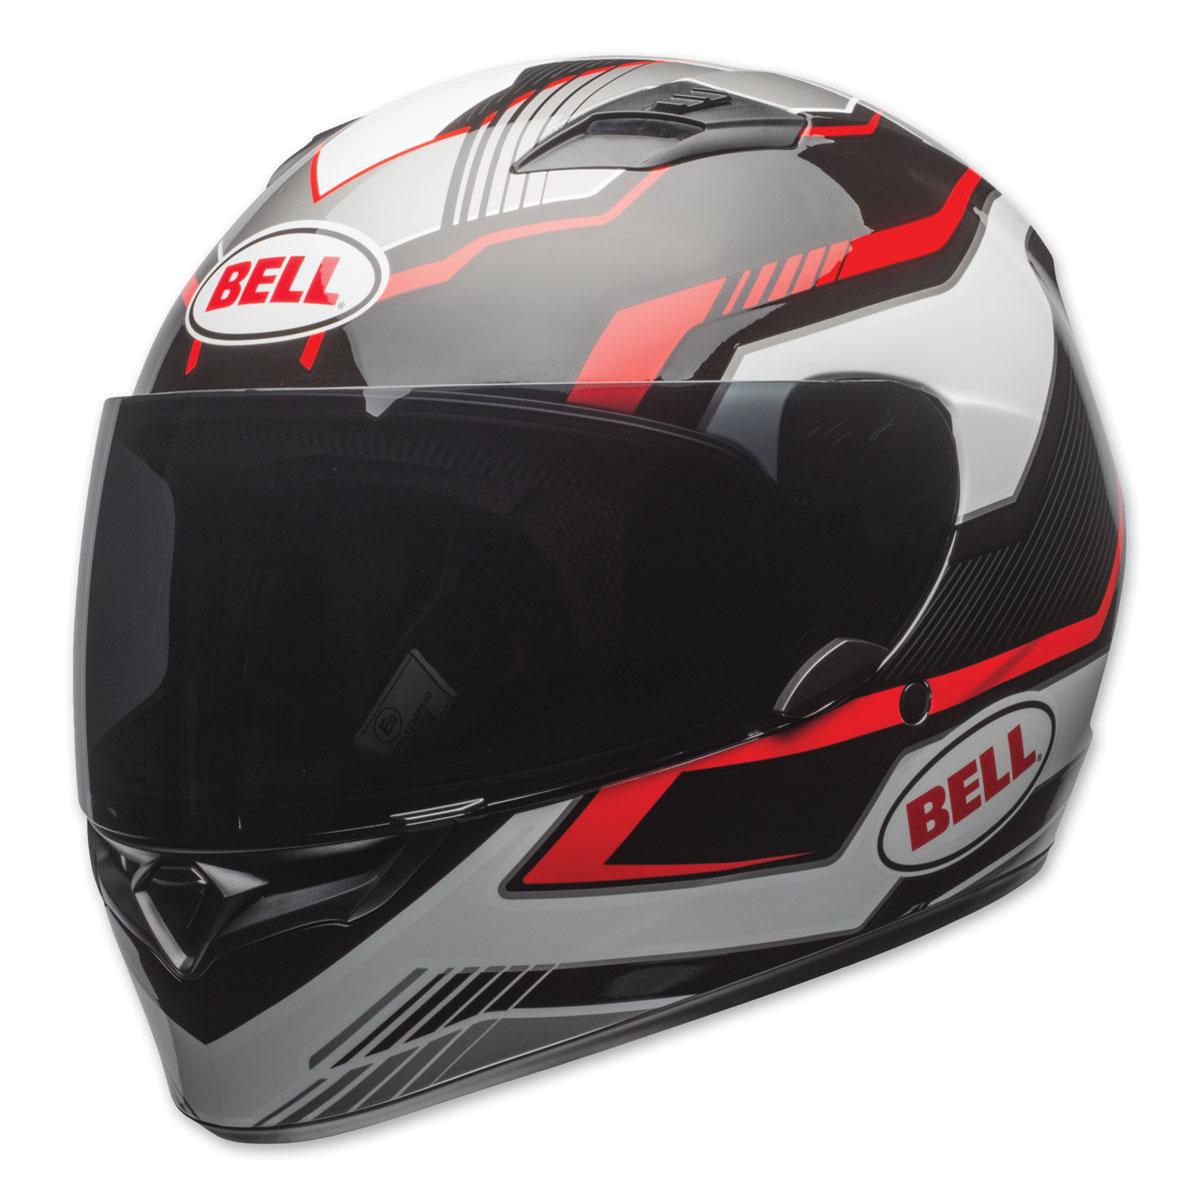 Bell Qualifier Torque Full Black/Red Face Helmet